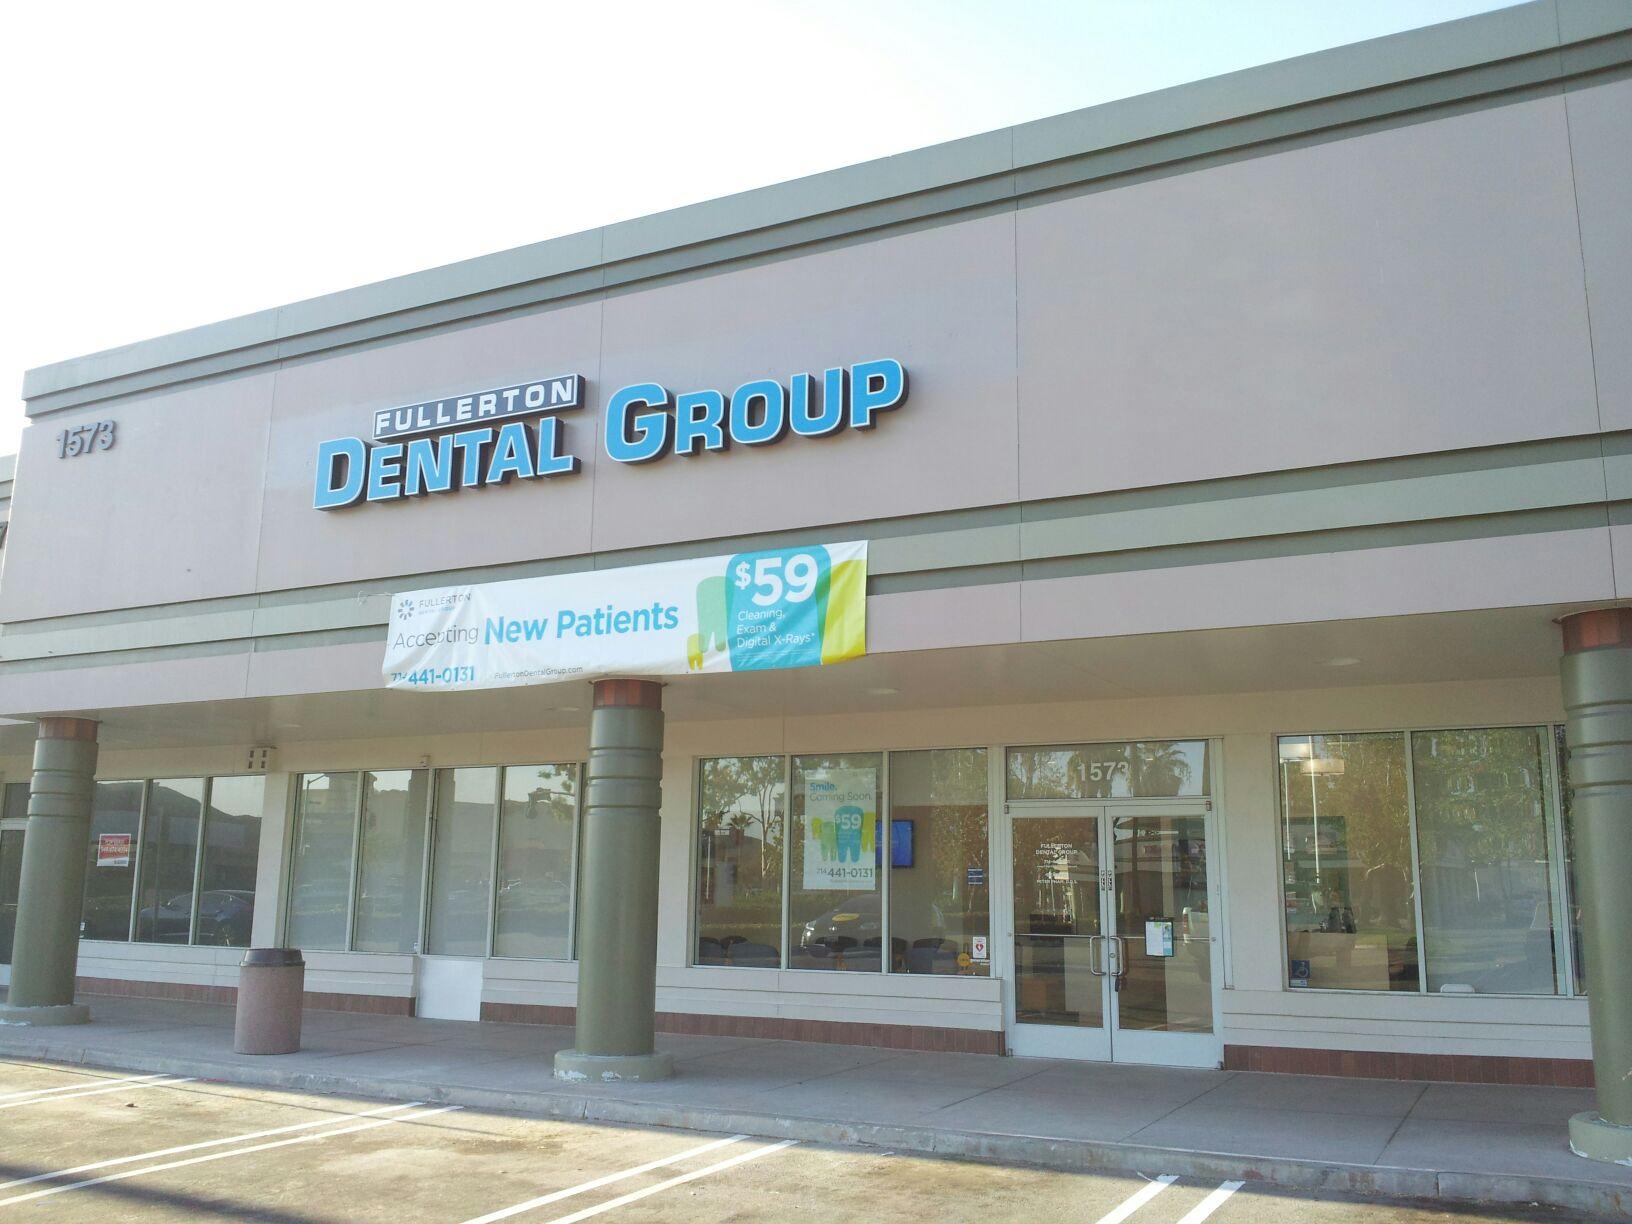 Fullerton Dental Group image 14